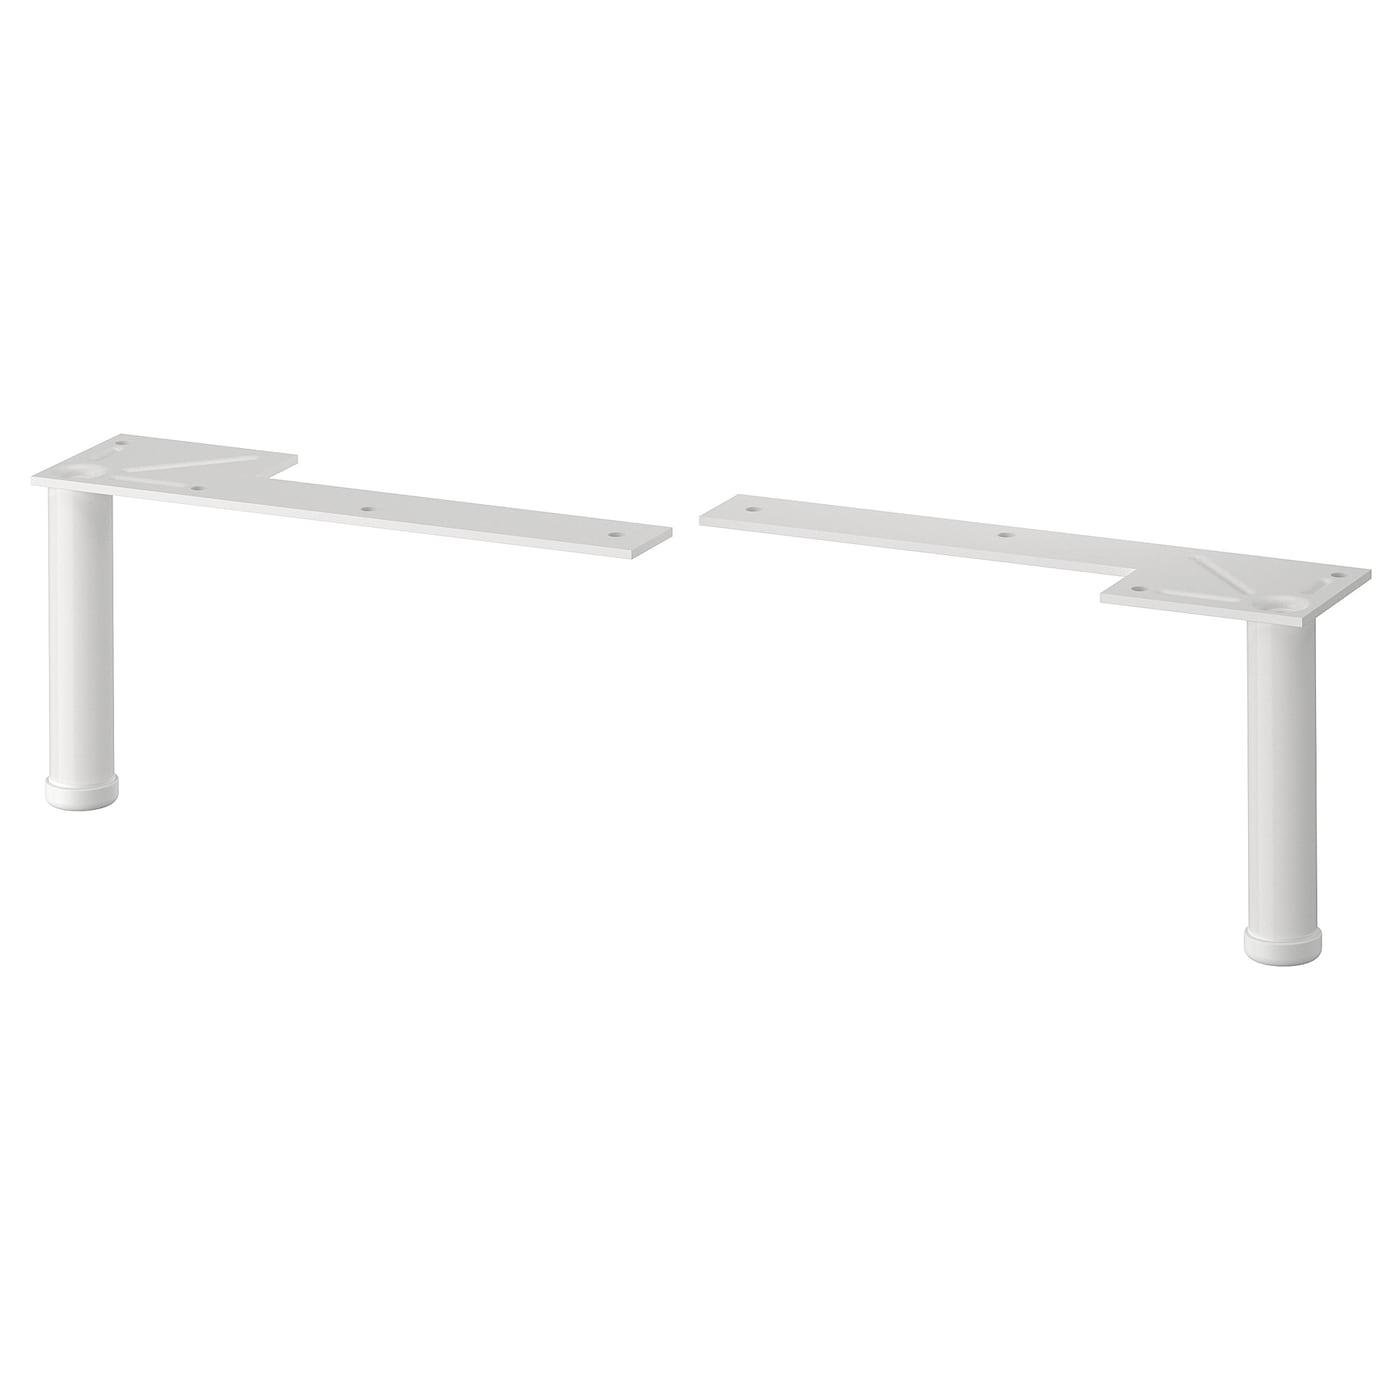 lill ngen pied blanc 11 12 cm ikea. Black Bedroom Furniture Sets. Home Design Ideas